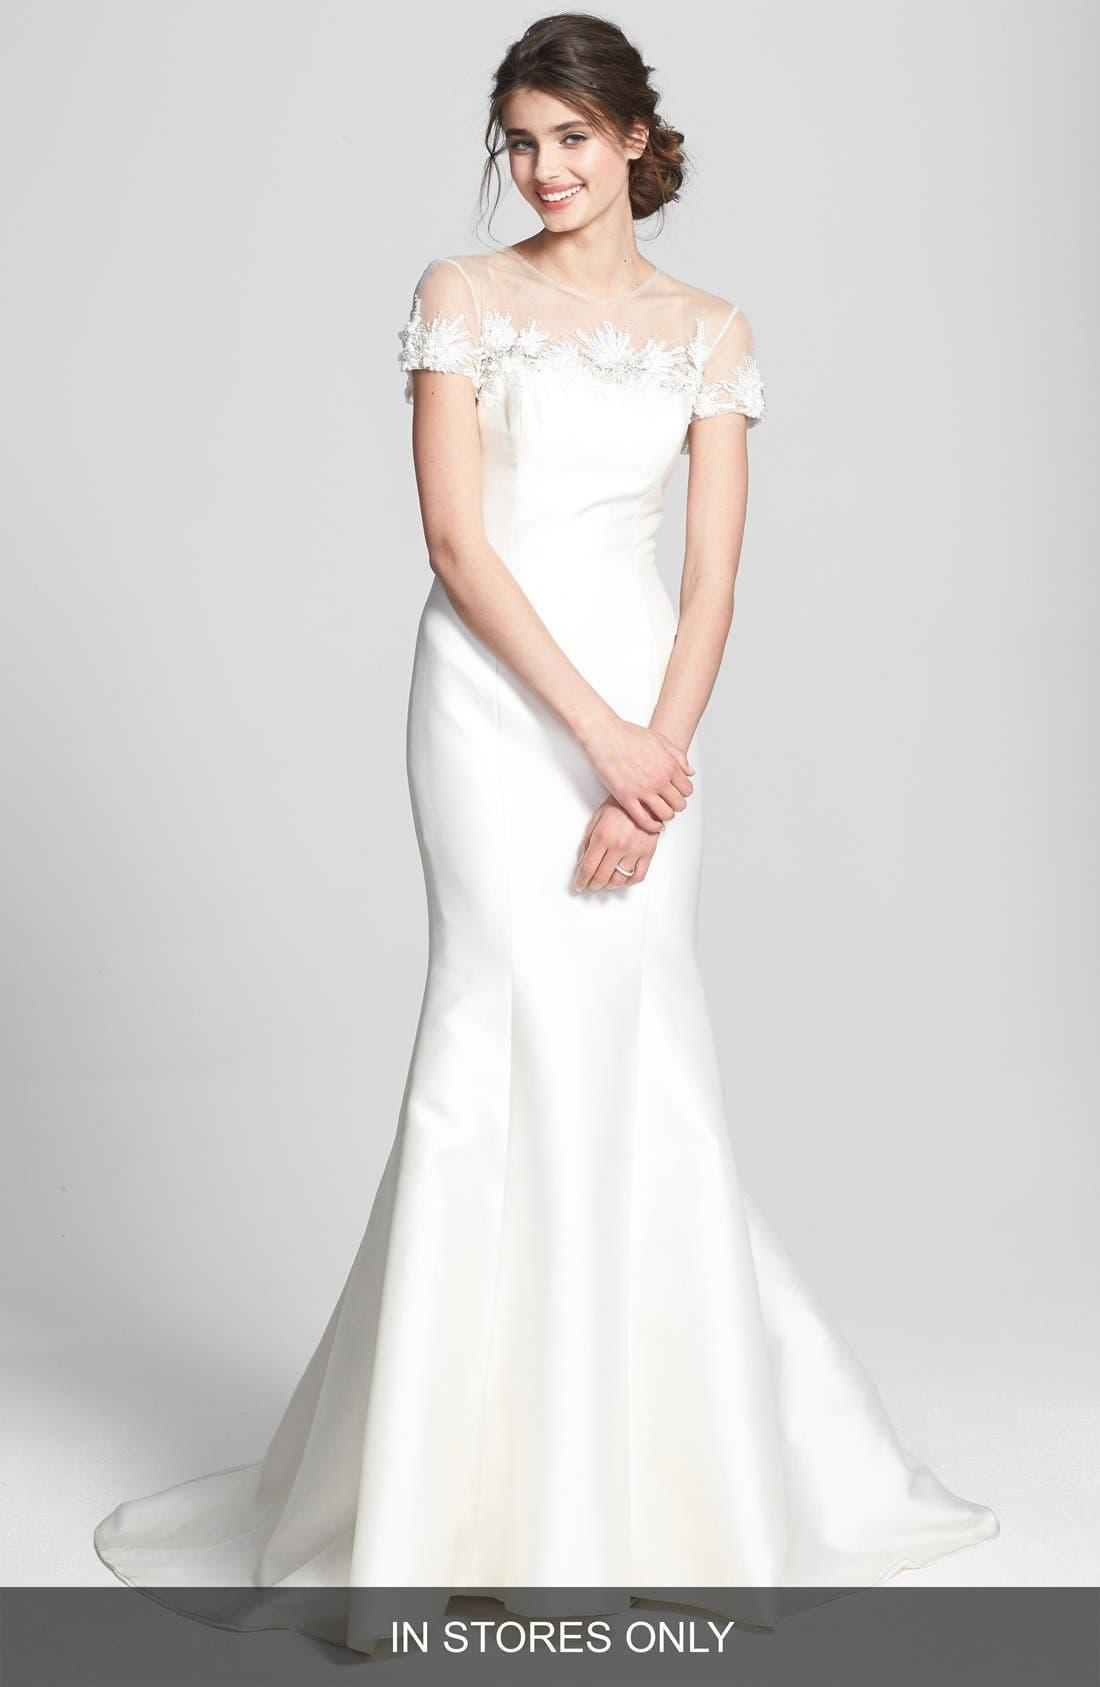 Alternate Image 1 Selected - Badgley Mischka Bridal 'Audrey' Cap Sleeve Embellished Mermaid Dress (In Stores Only)